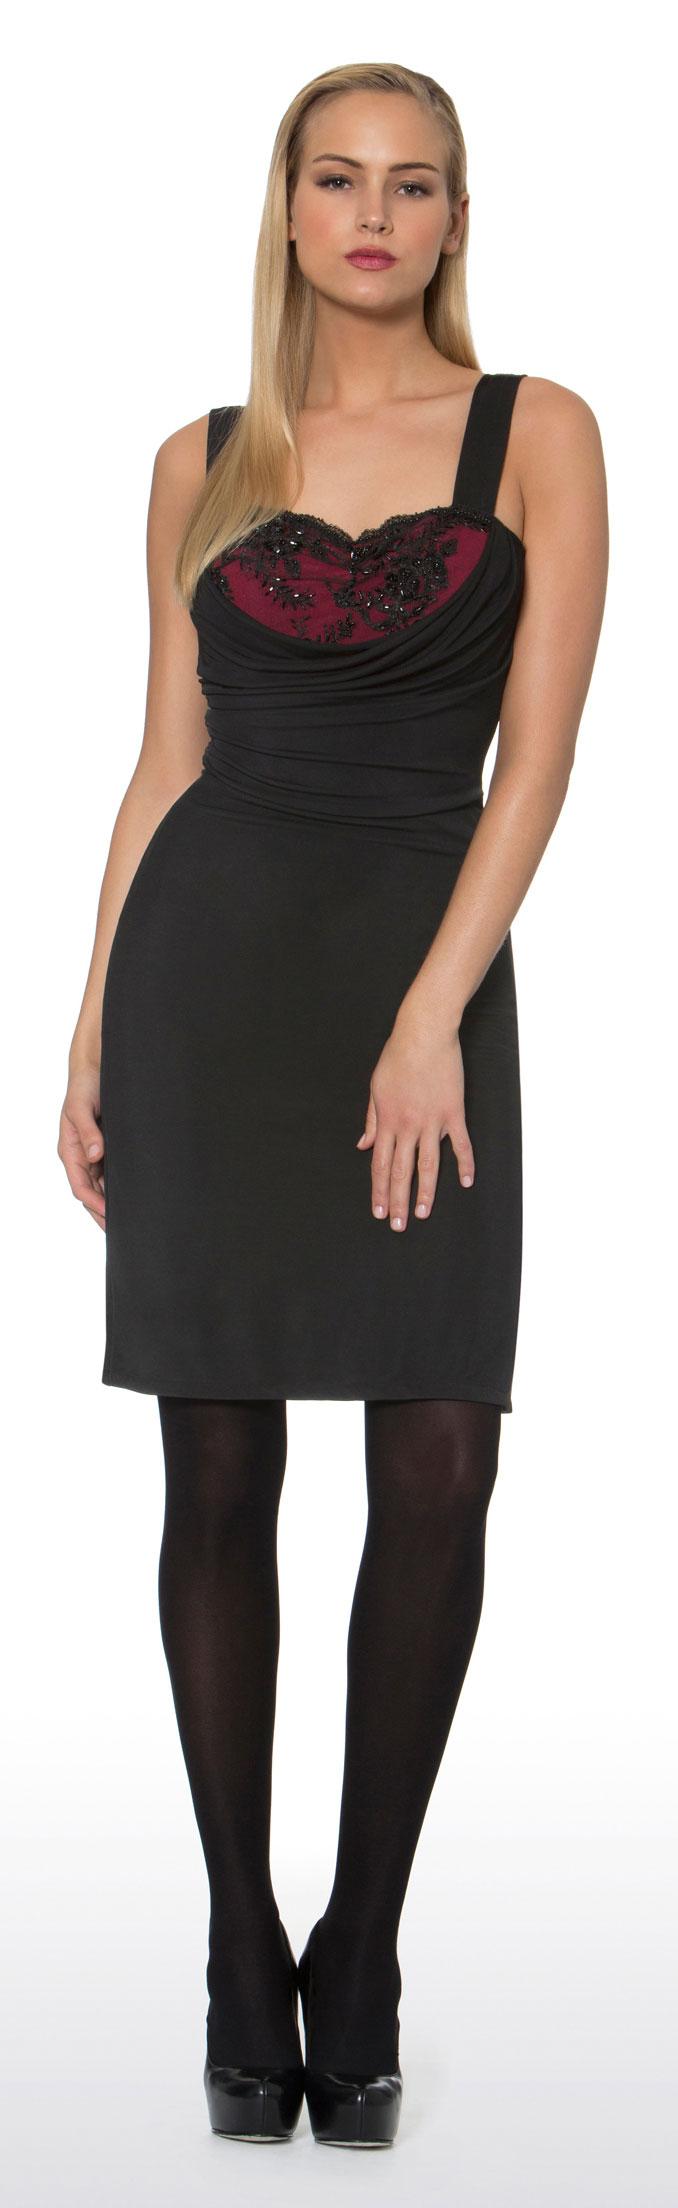 Z-Form-Uniform-Kelsy-Zimba-Dress-CD1.jpg